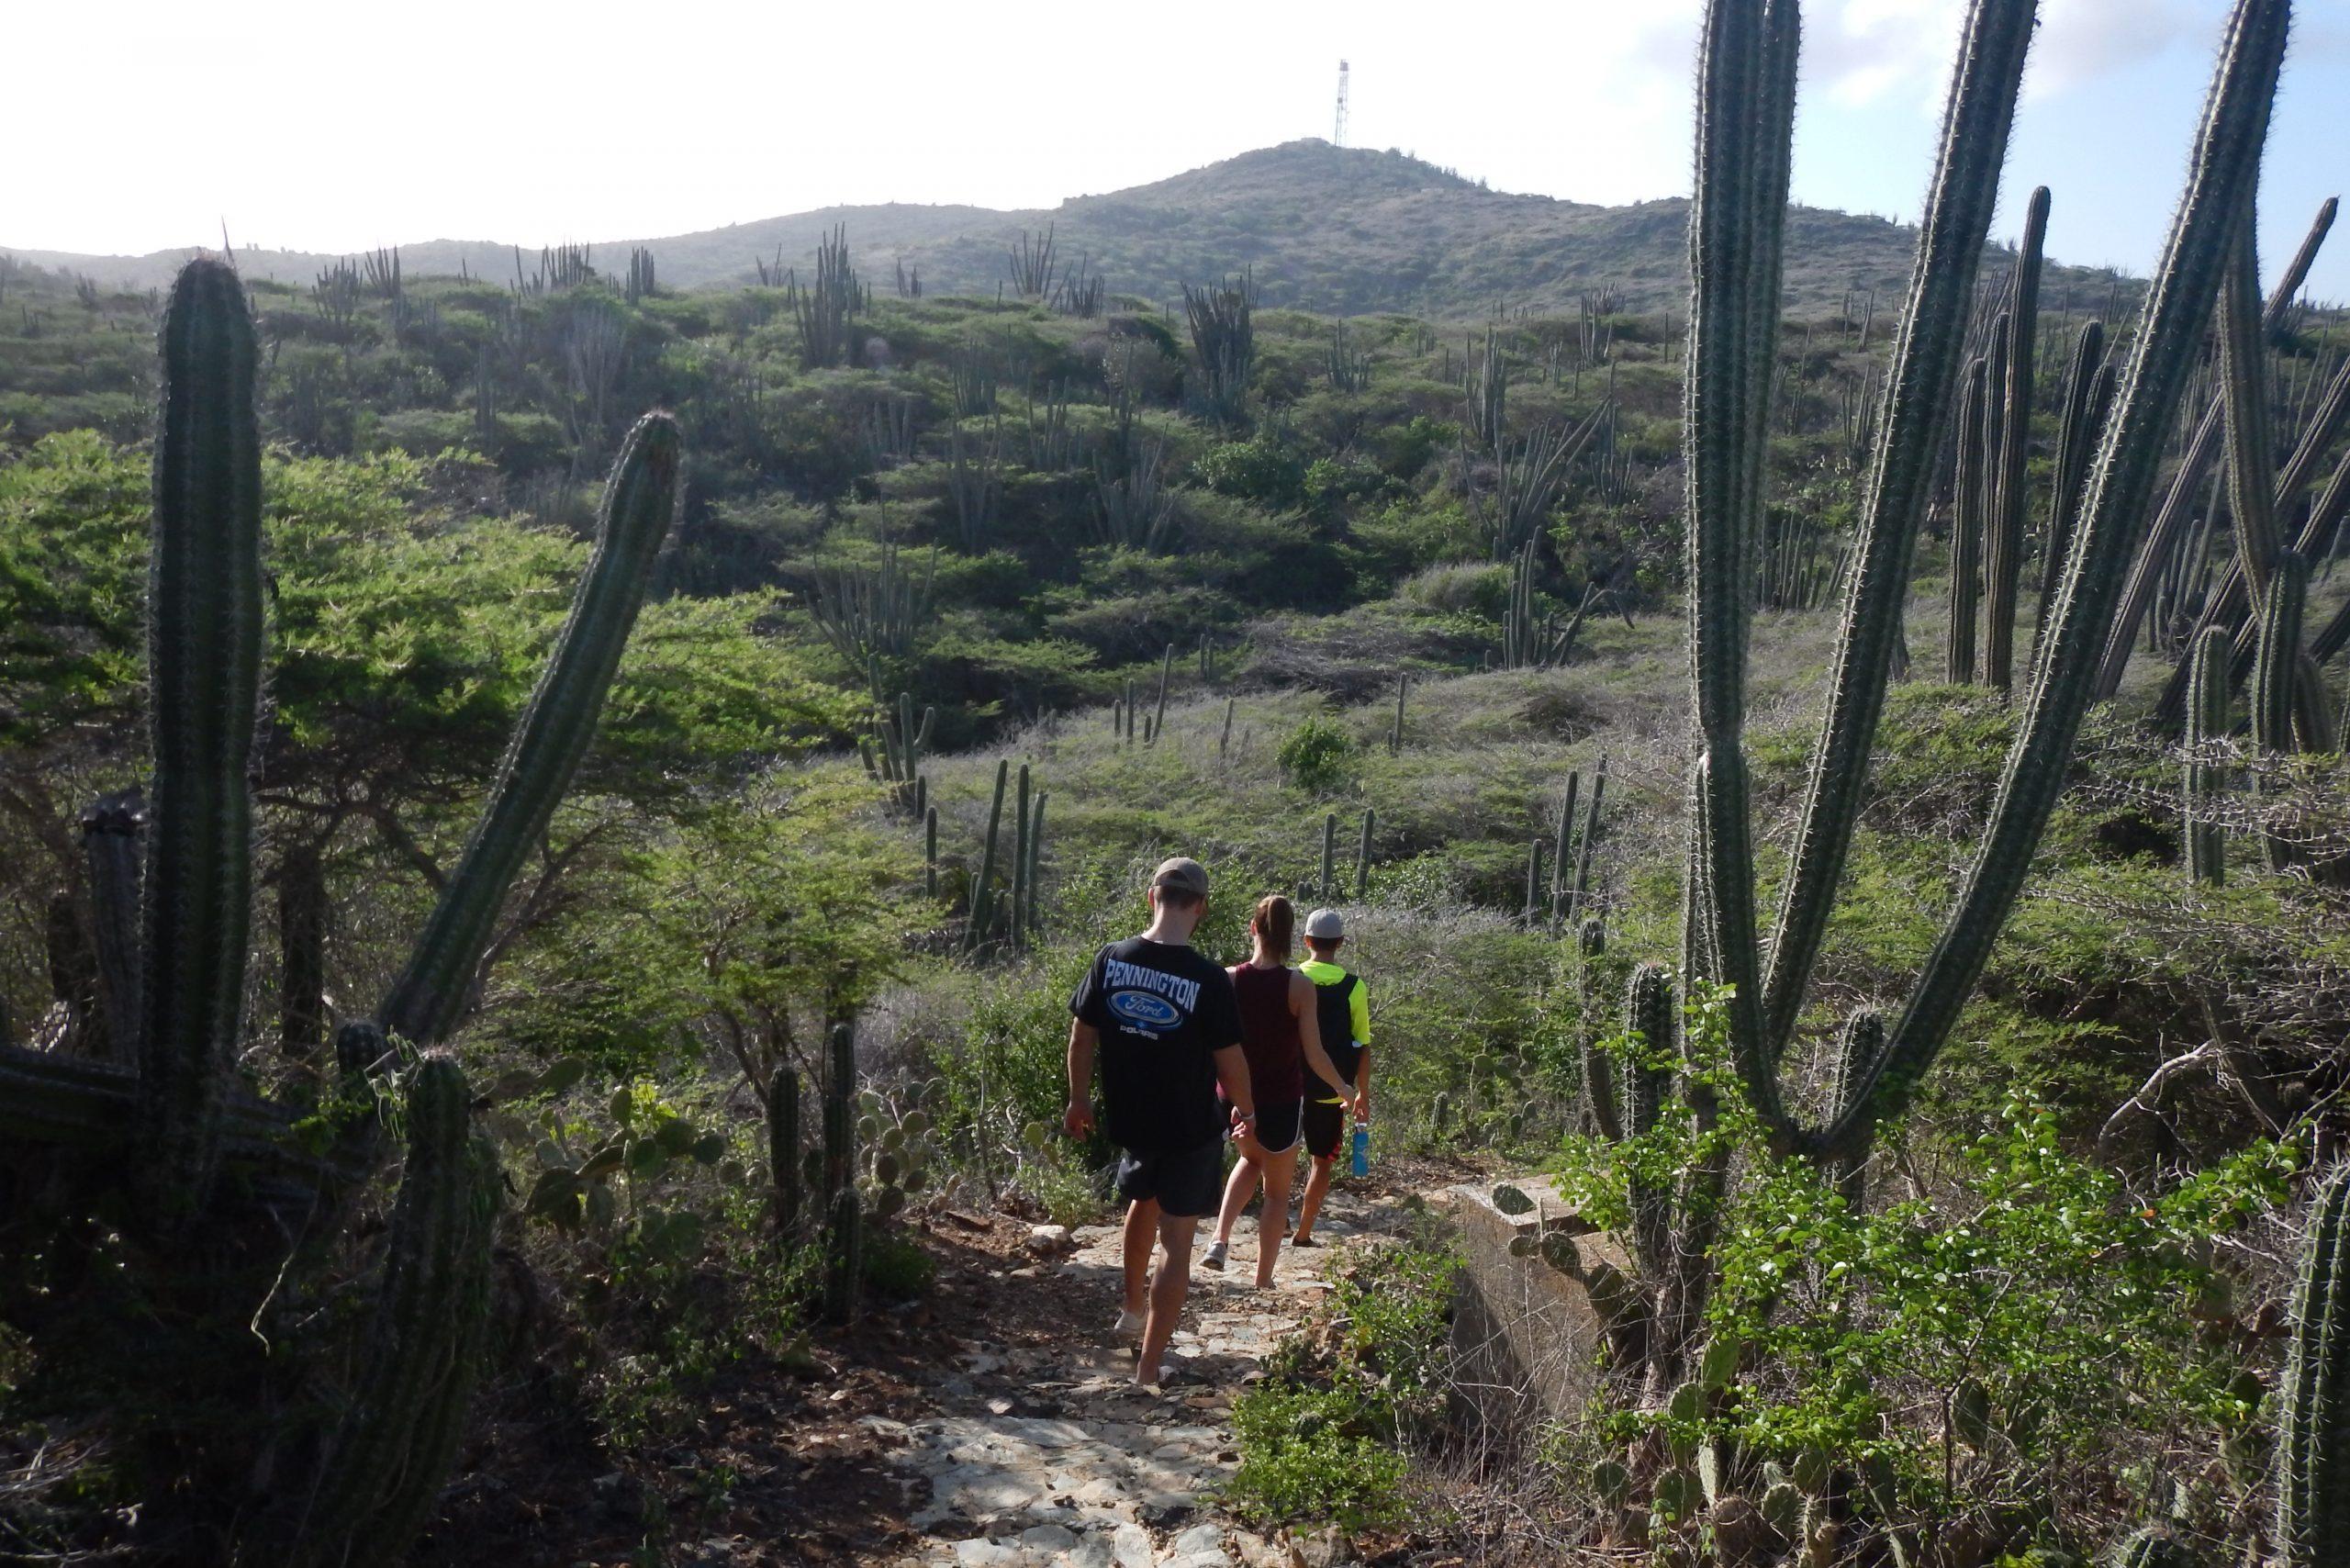 Hiking in Arikok National Park